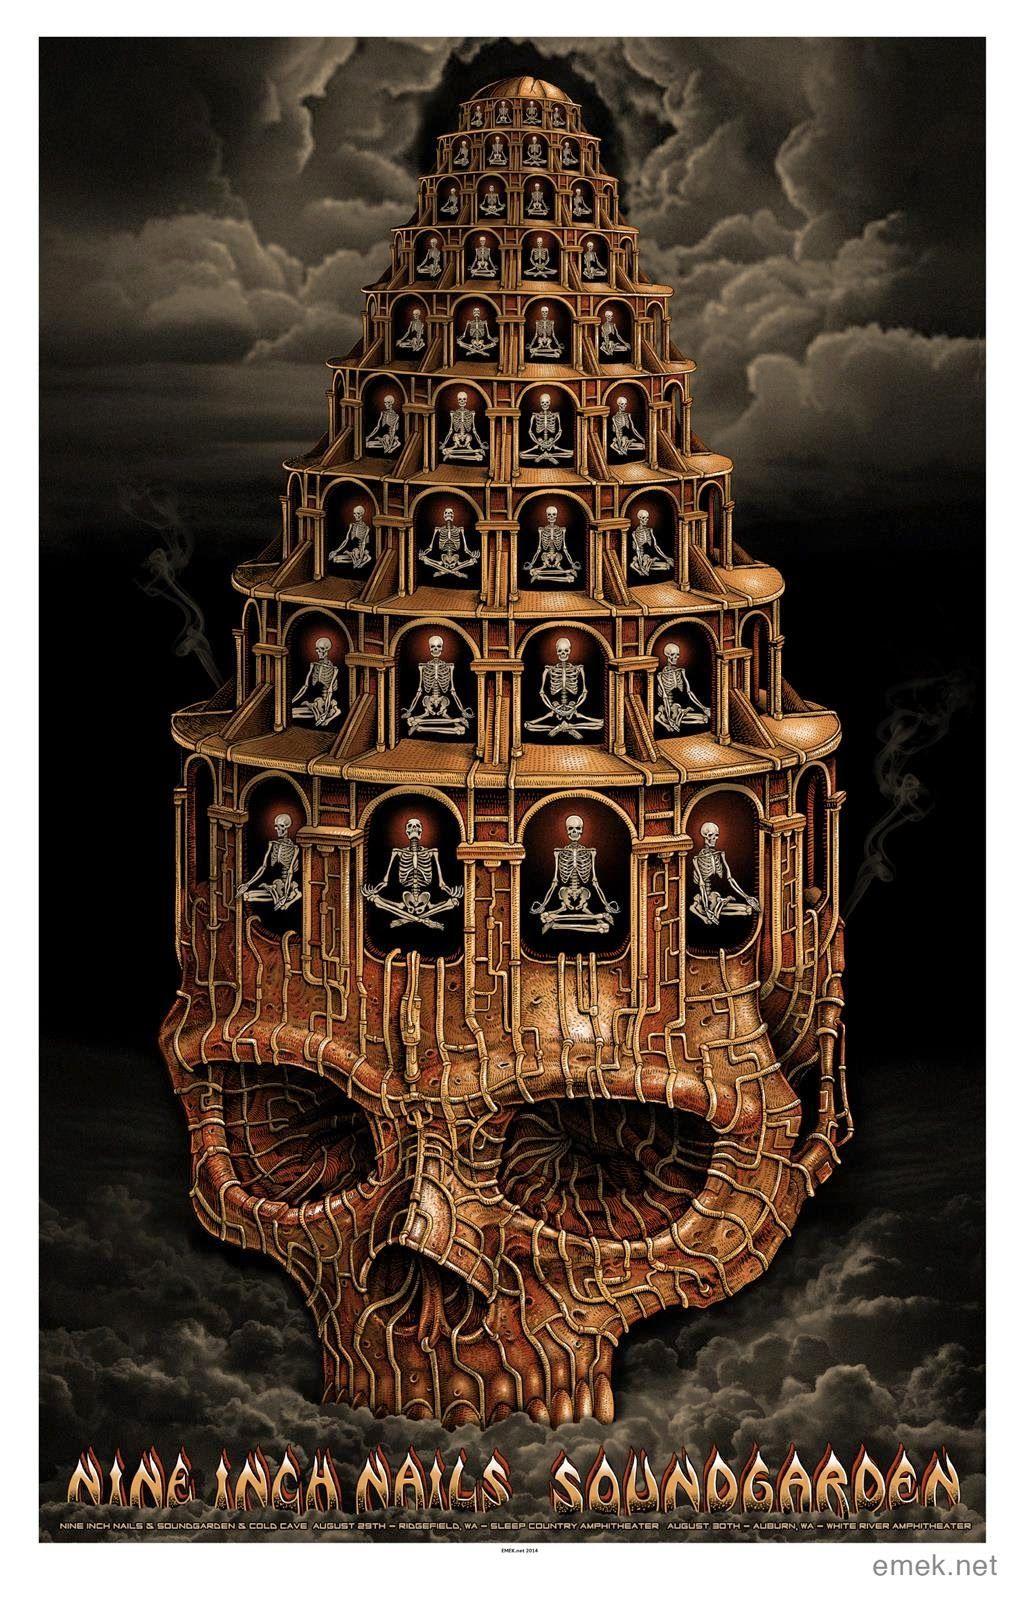 Emek Nine Inch Nails Soundgarden Portland Seattle Poster   Pinterest ...